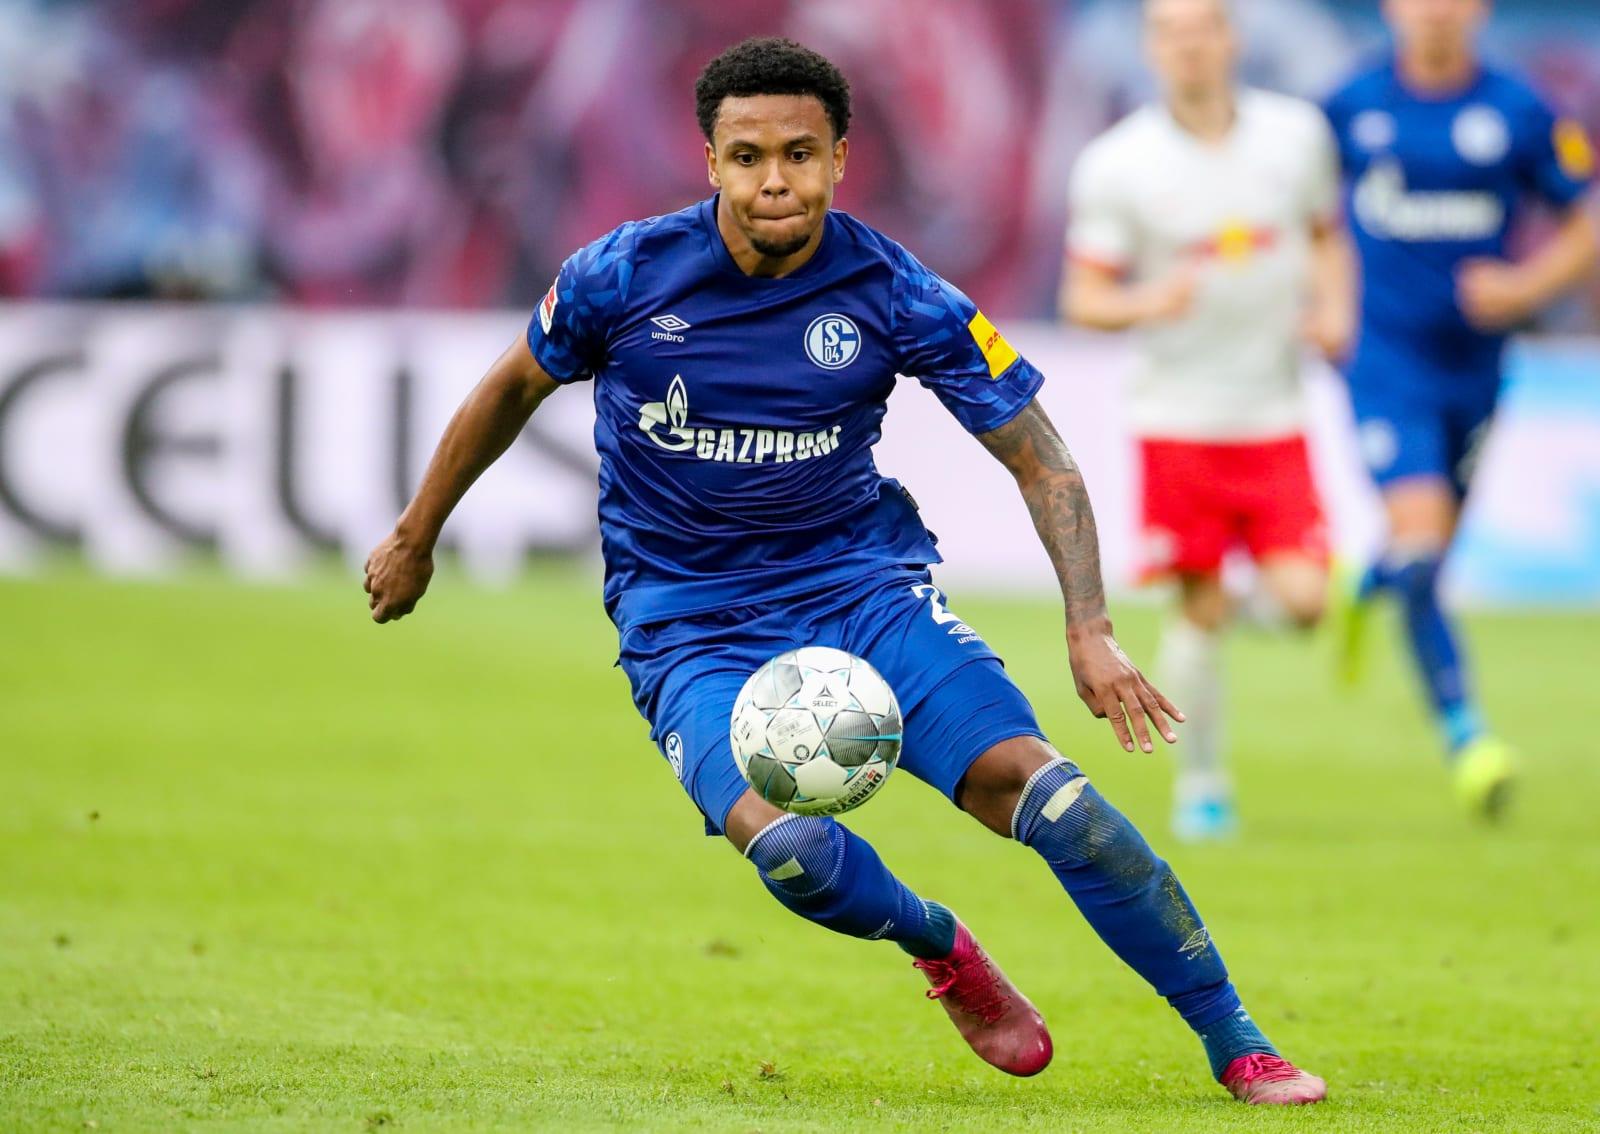 Espn Was Already An Insane Deal Now It Has The Bundesliga Engadget